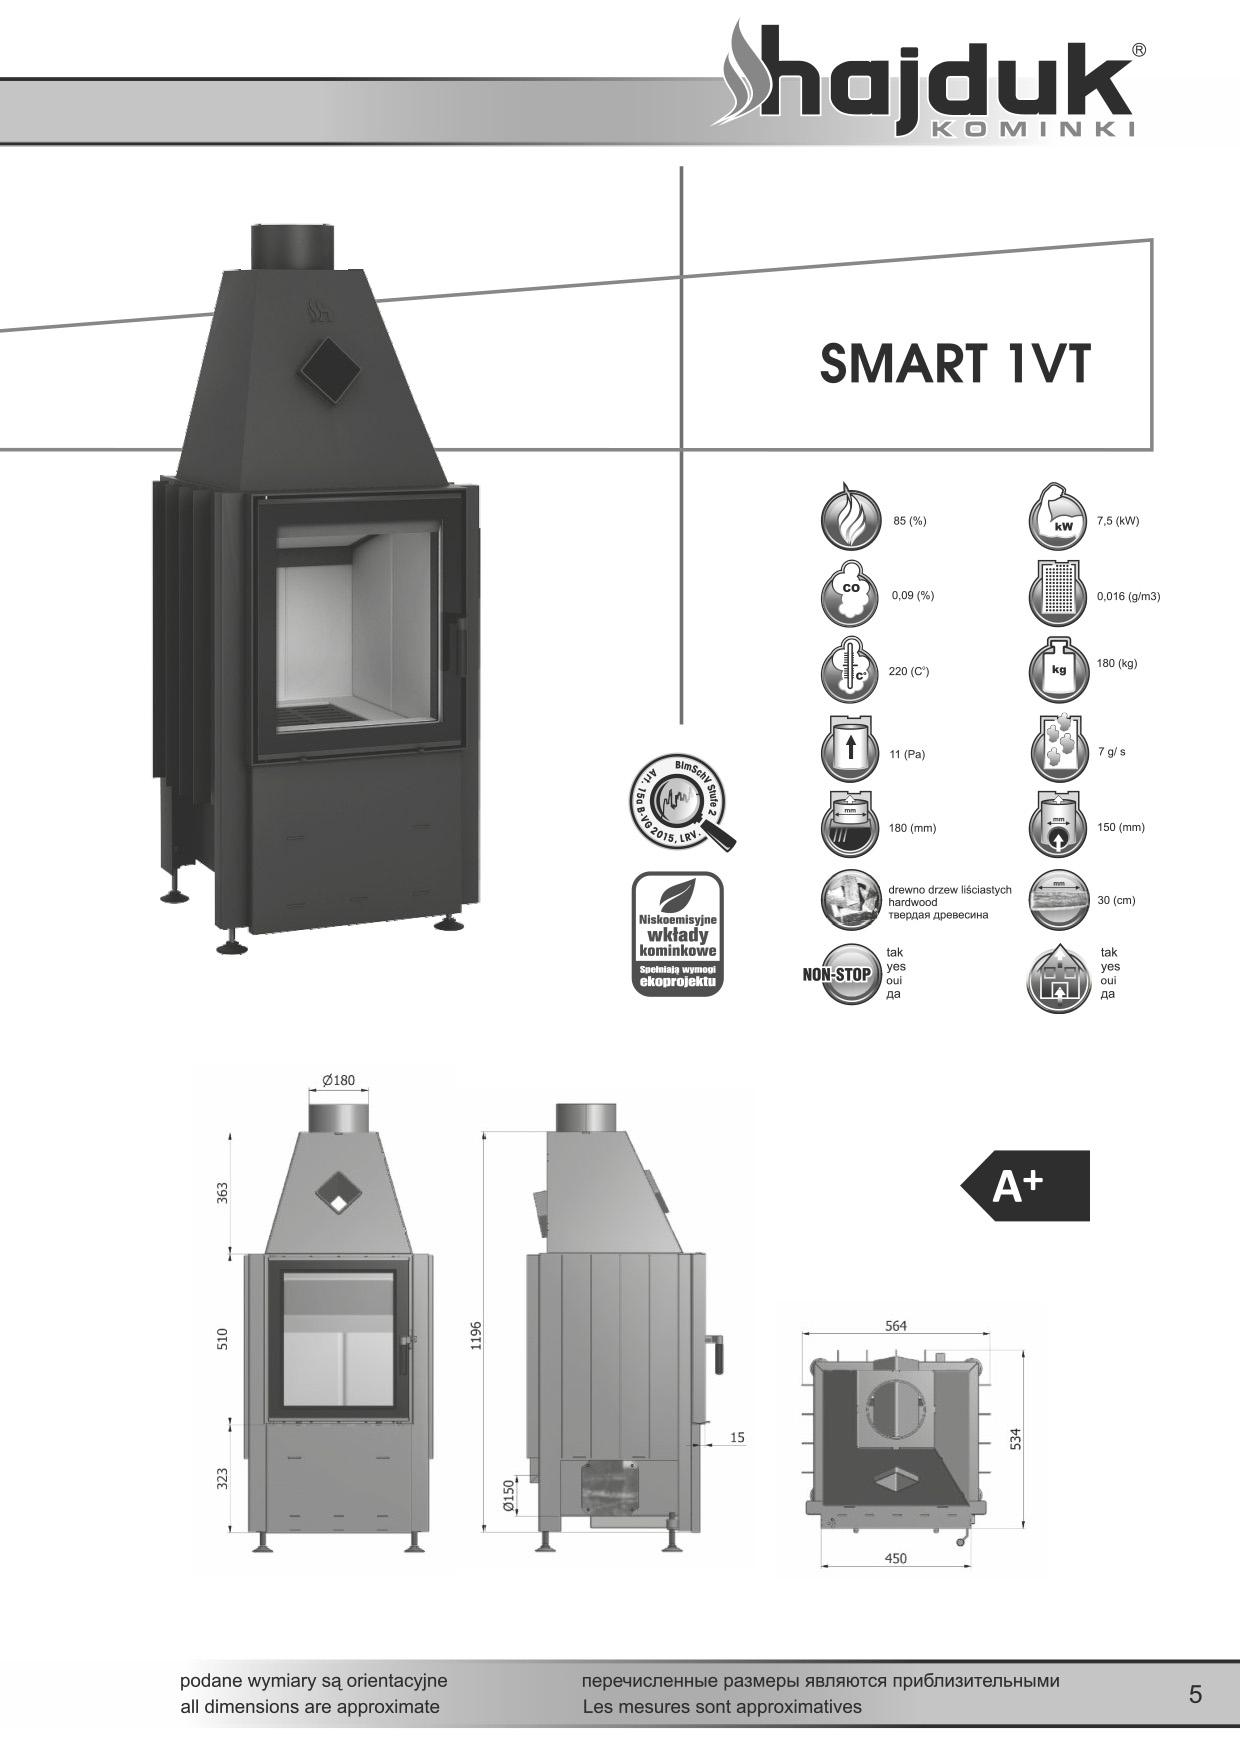 Smart%201VT%20 %20karta%20techniczna - Fireplace insert Hajduk Smart 1VT